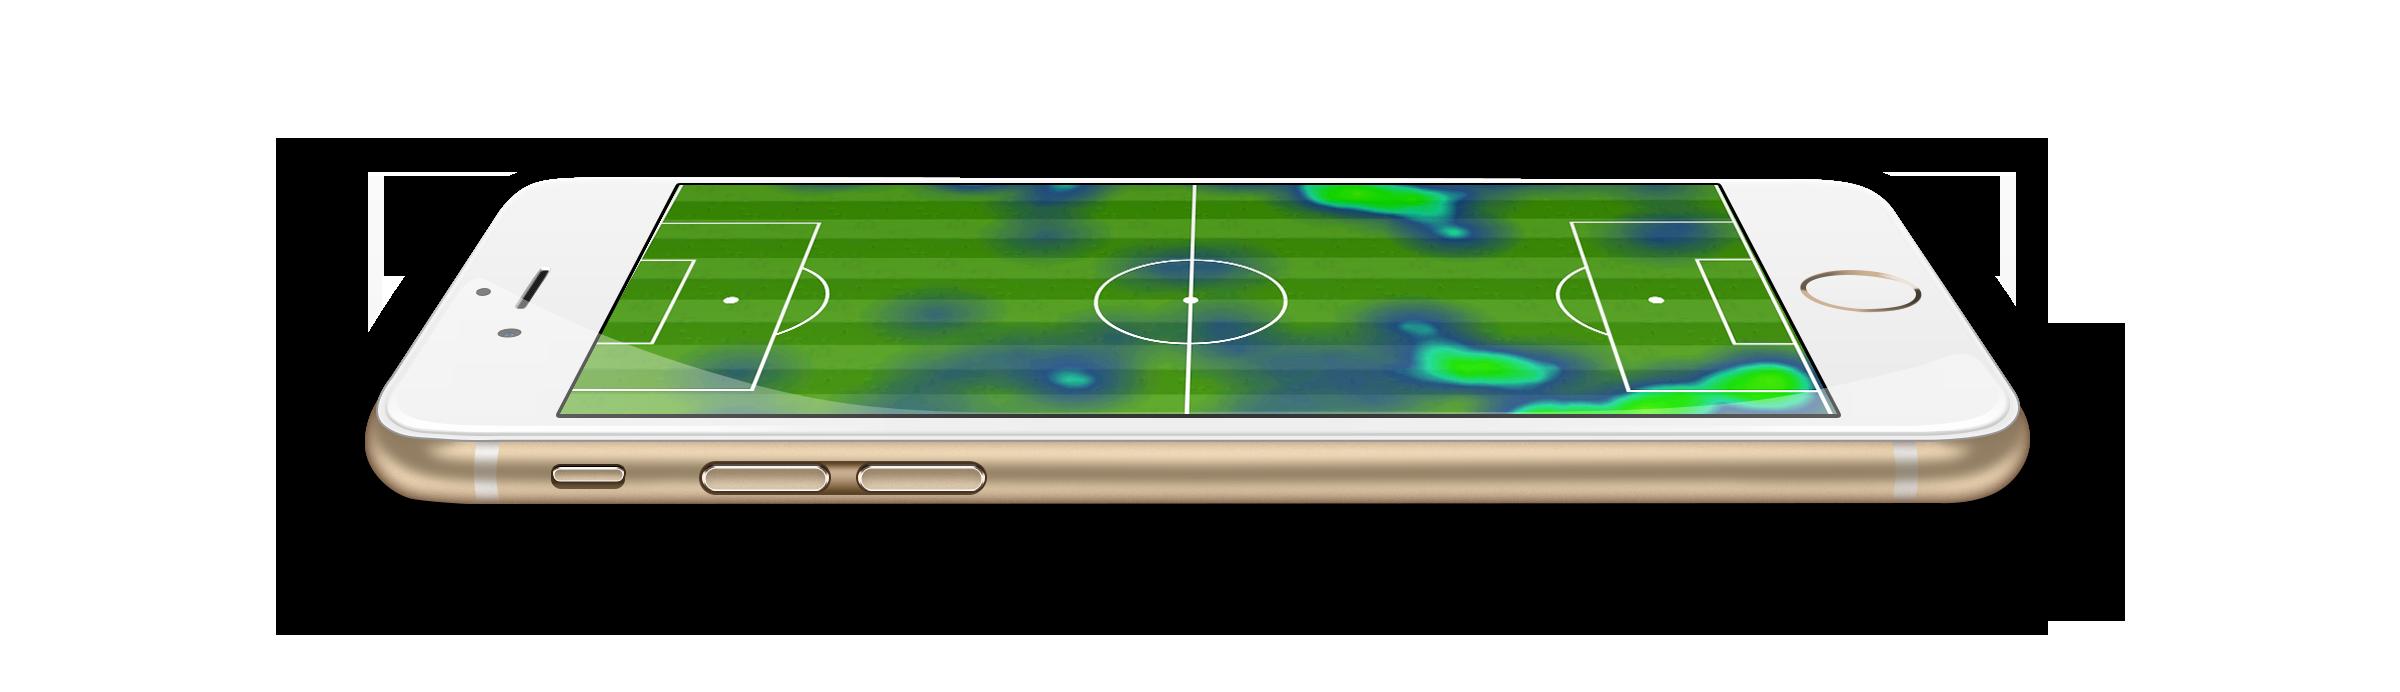 IntelStats | Football Data and Performance Analysis Solutions